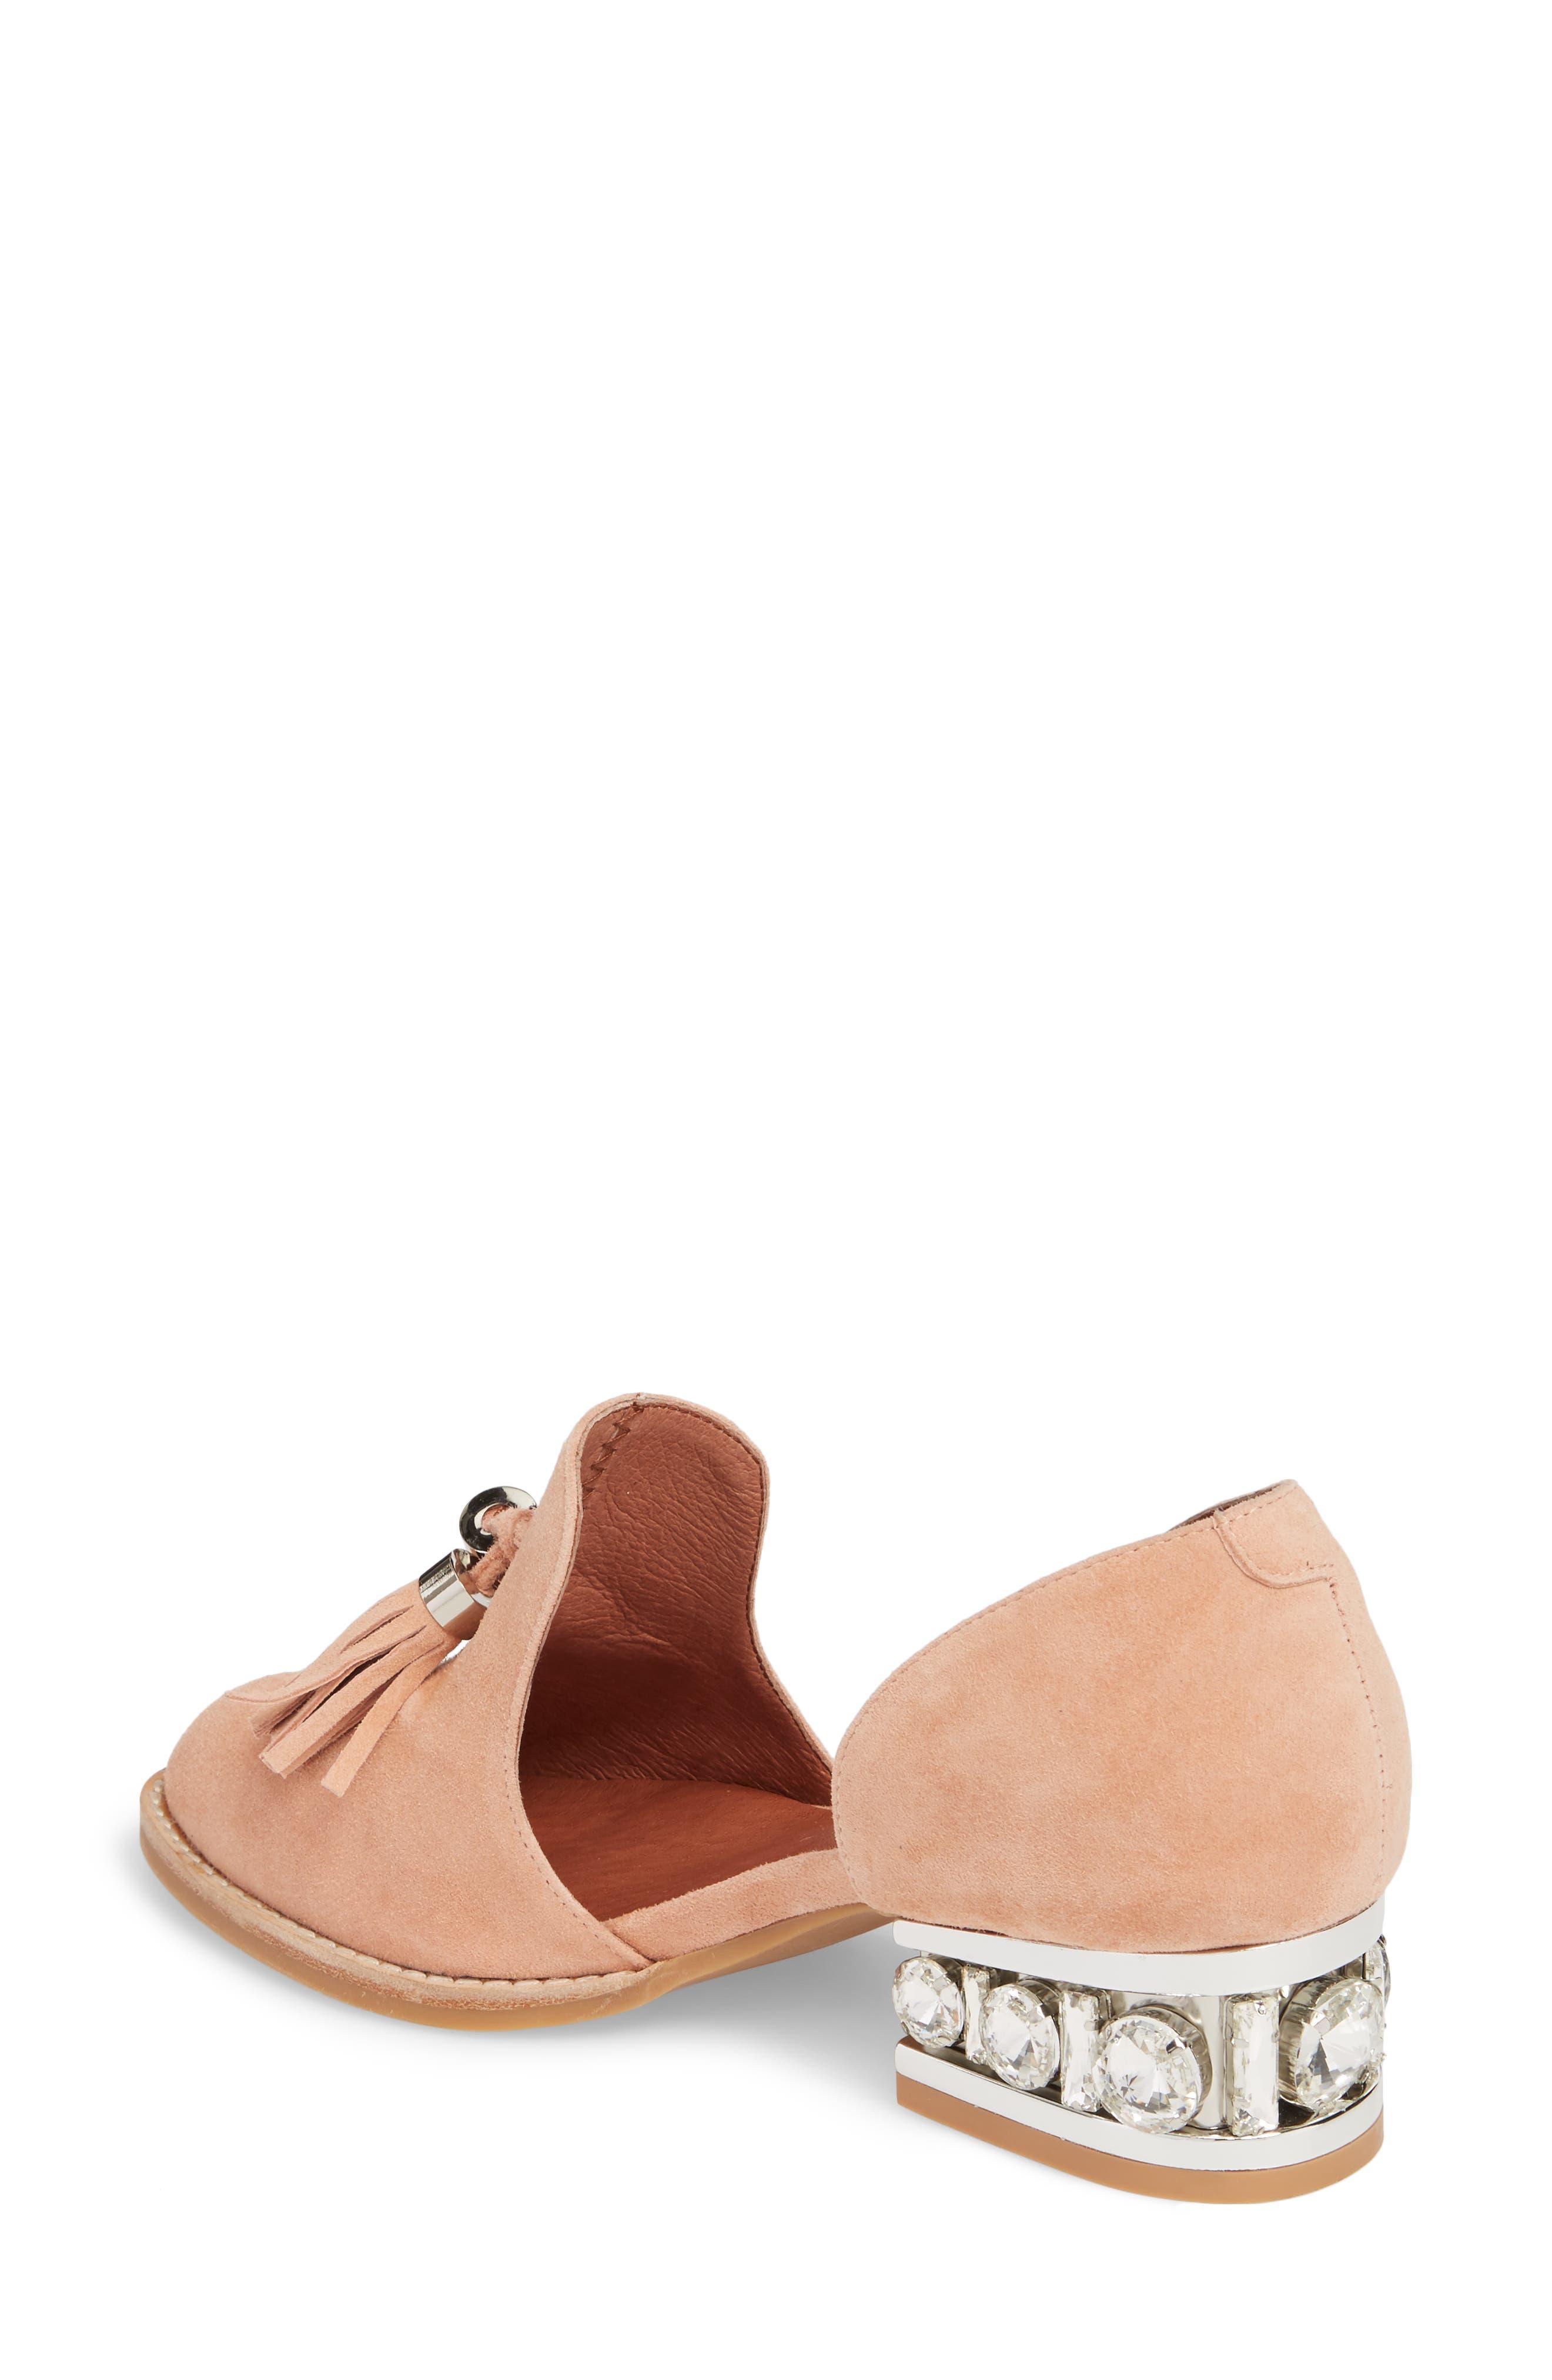 Civil Studded Loafer,                             Alternate thumbnail 2, color,                             Blush/ Silver Suede